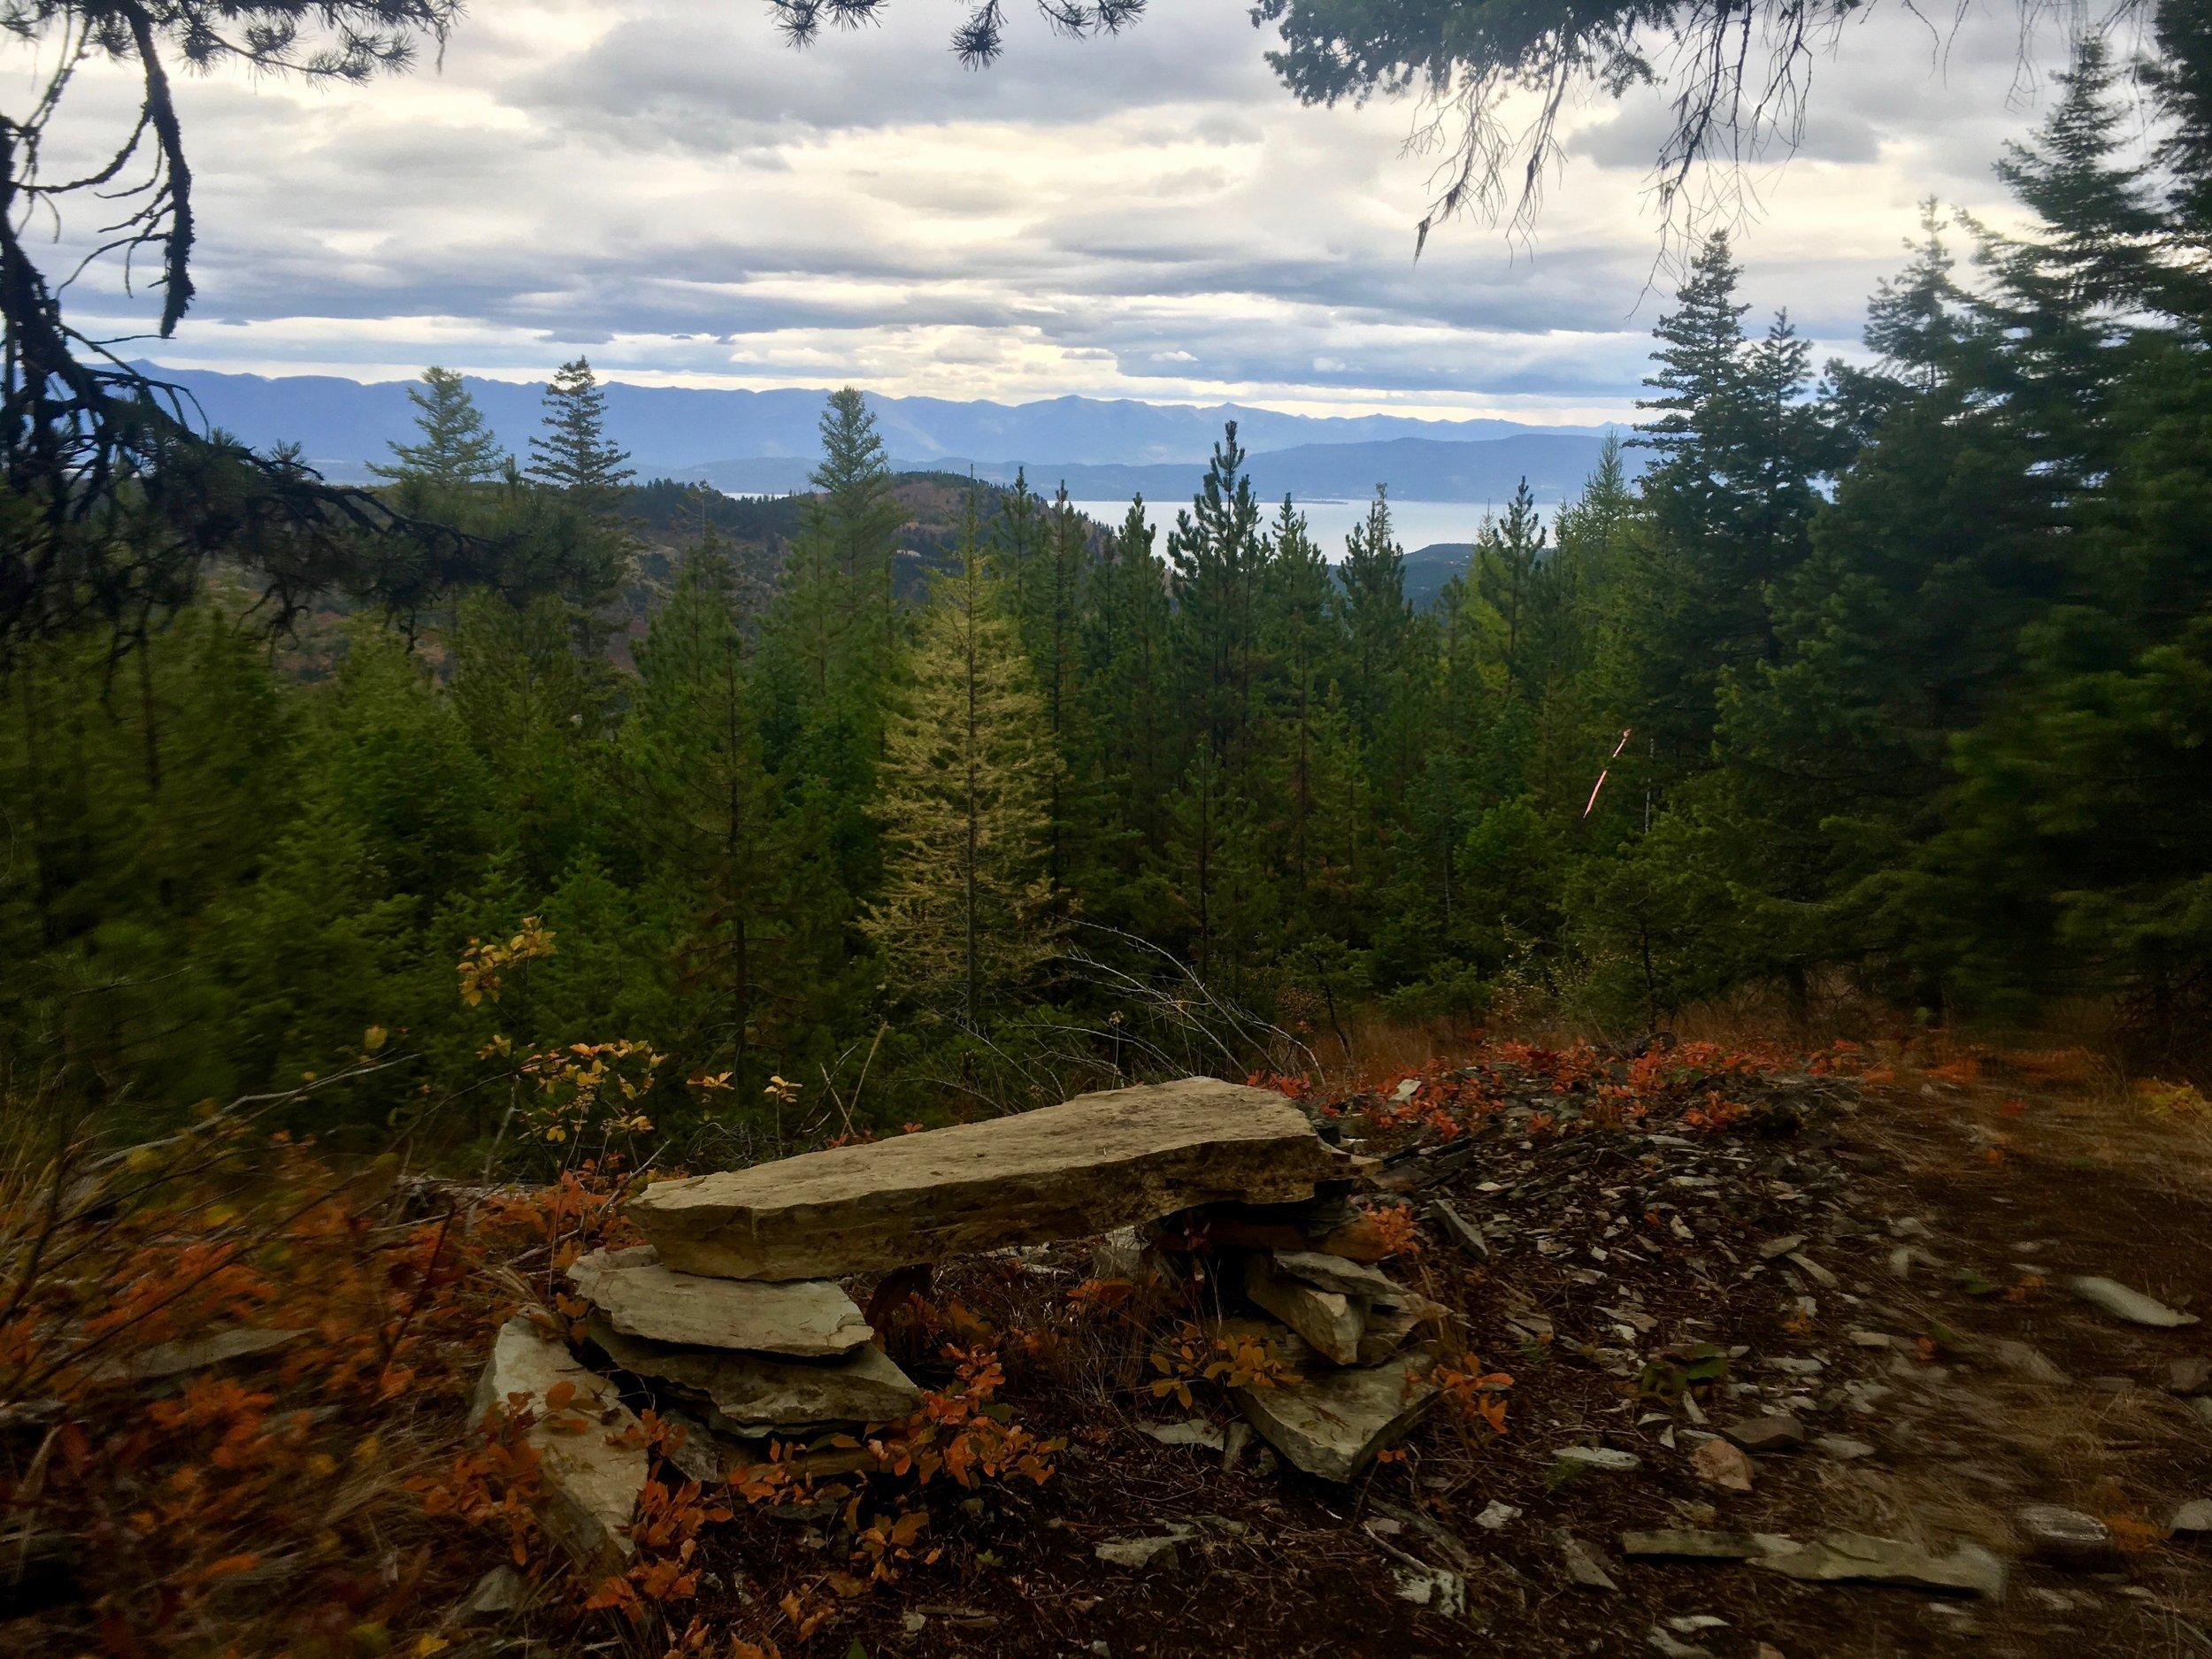 foys to blacktail trails trail marathon ftbtIMG_1724.JPG